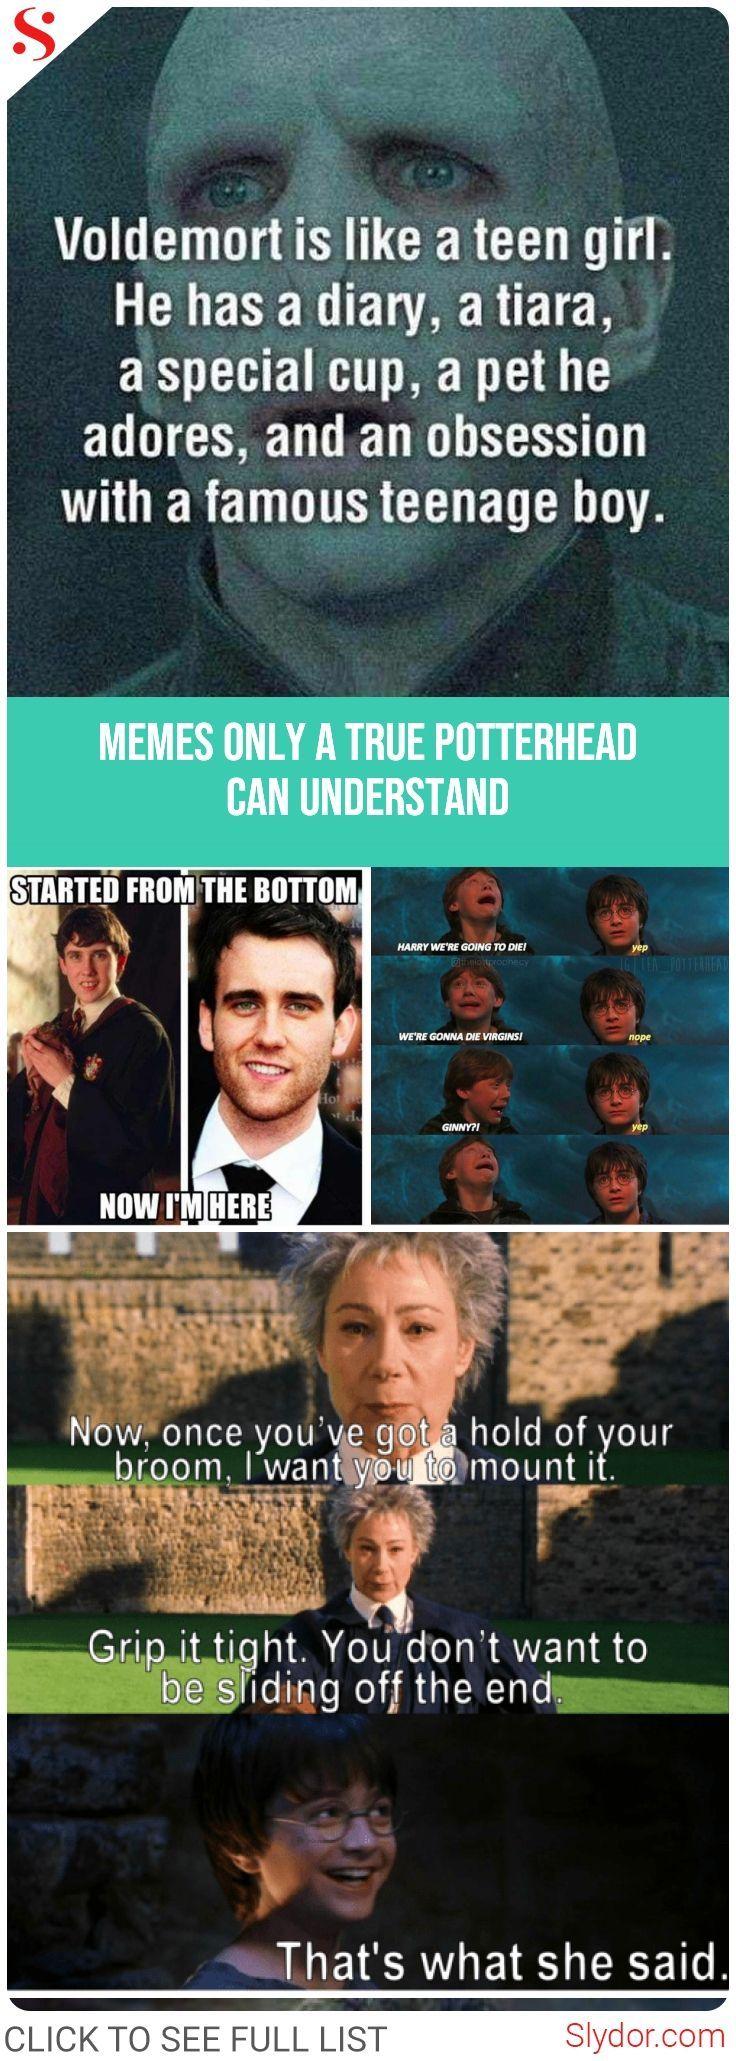 Harry Potter Memes - Only A True Potterhead Can Understand   Harry